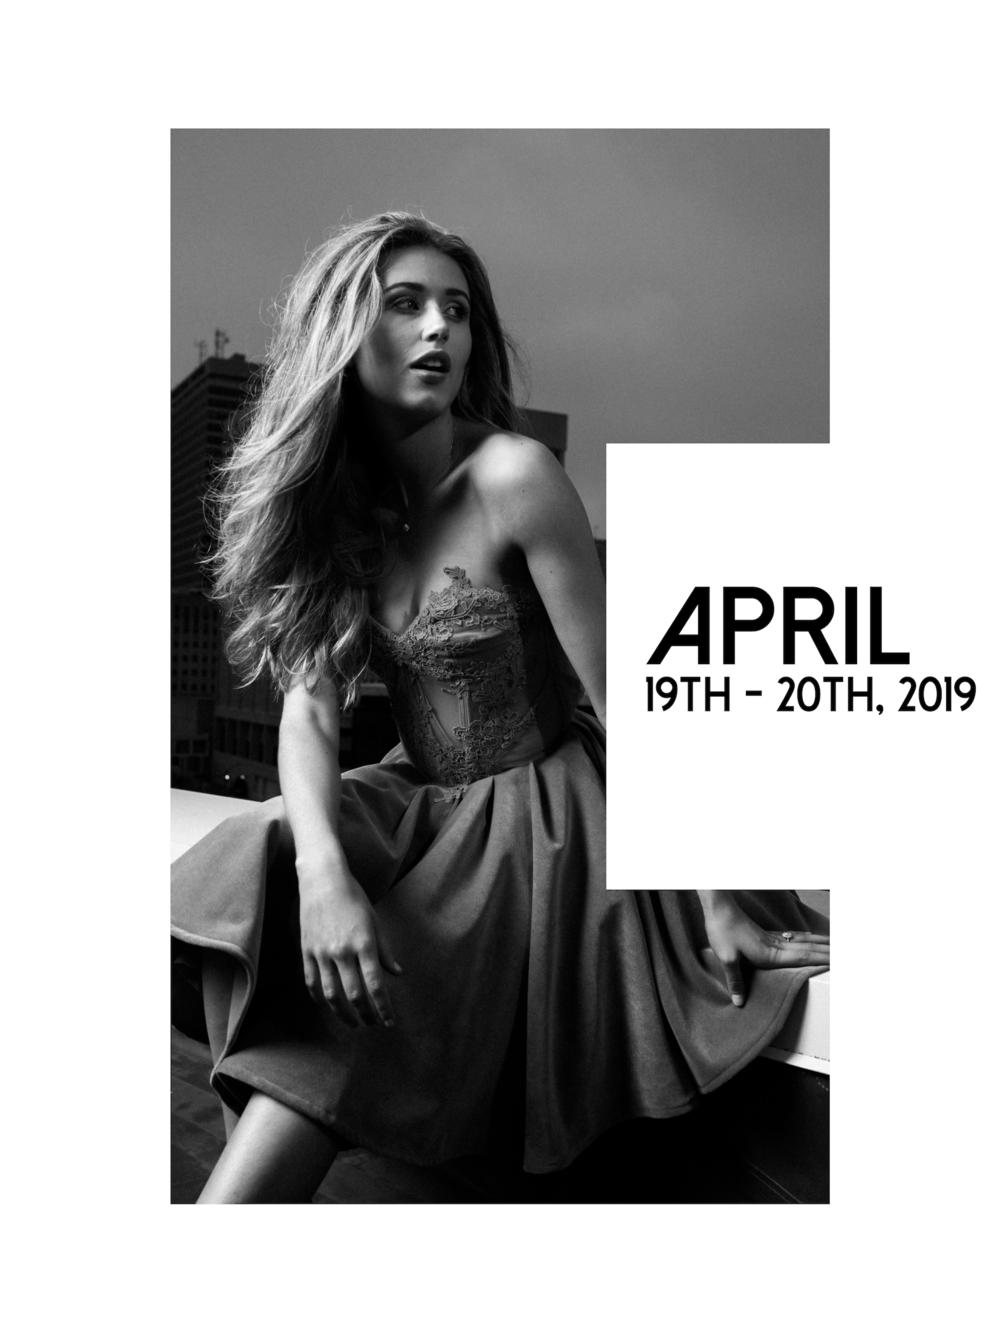 APRIL 19th - 20th, 2019.png